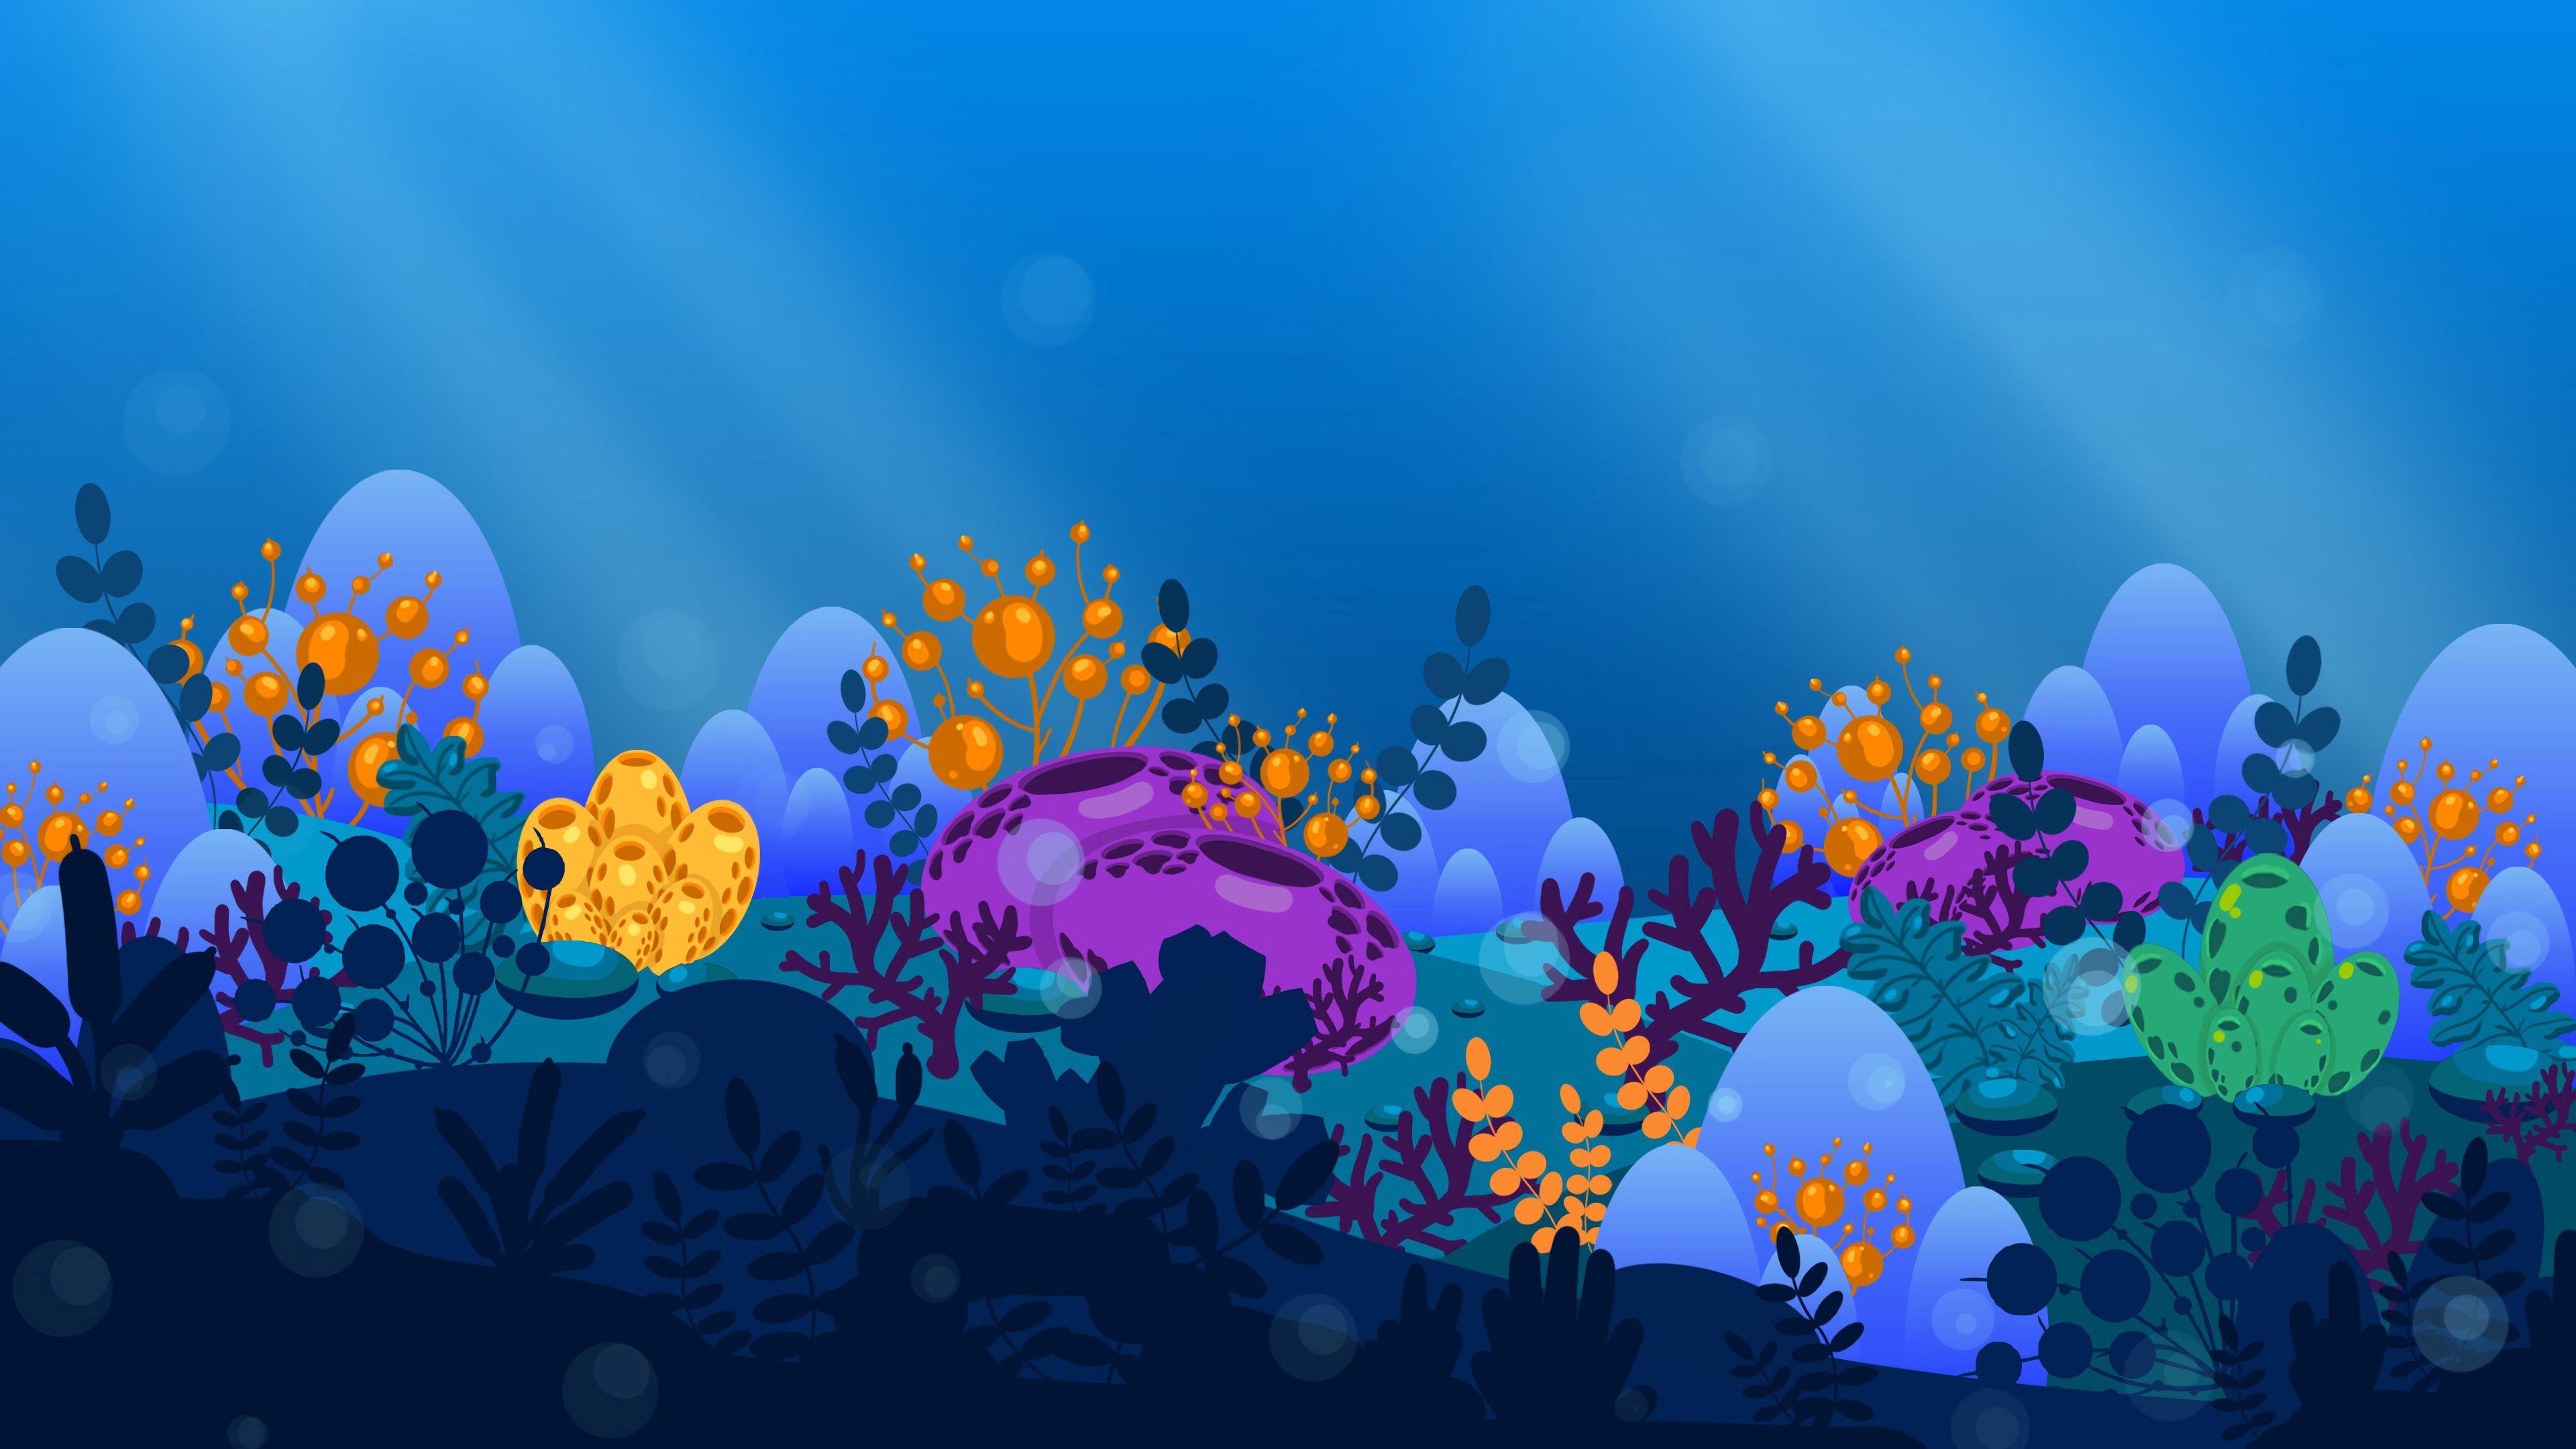 144407 download wallpaper Vector, Seaweed, Algae, Sea, Art screensavers and pictures for free